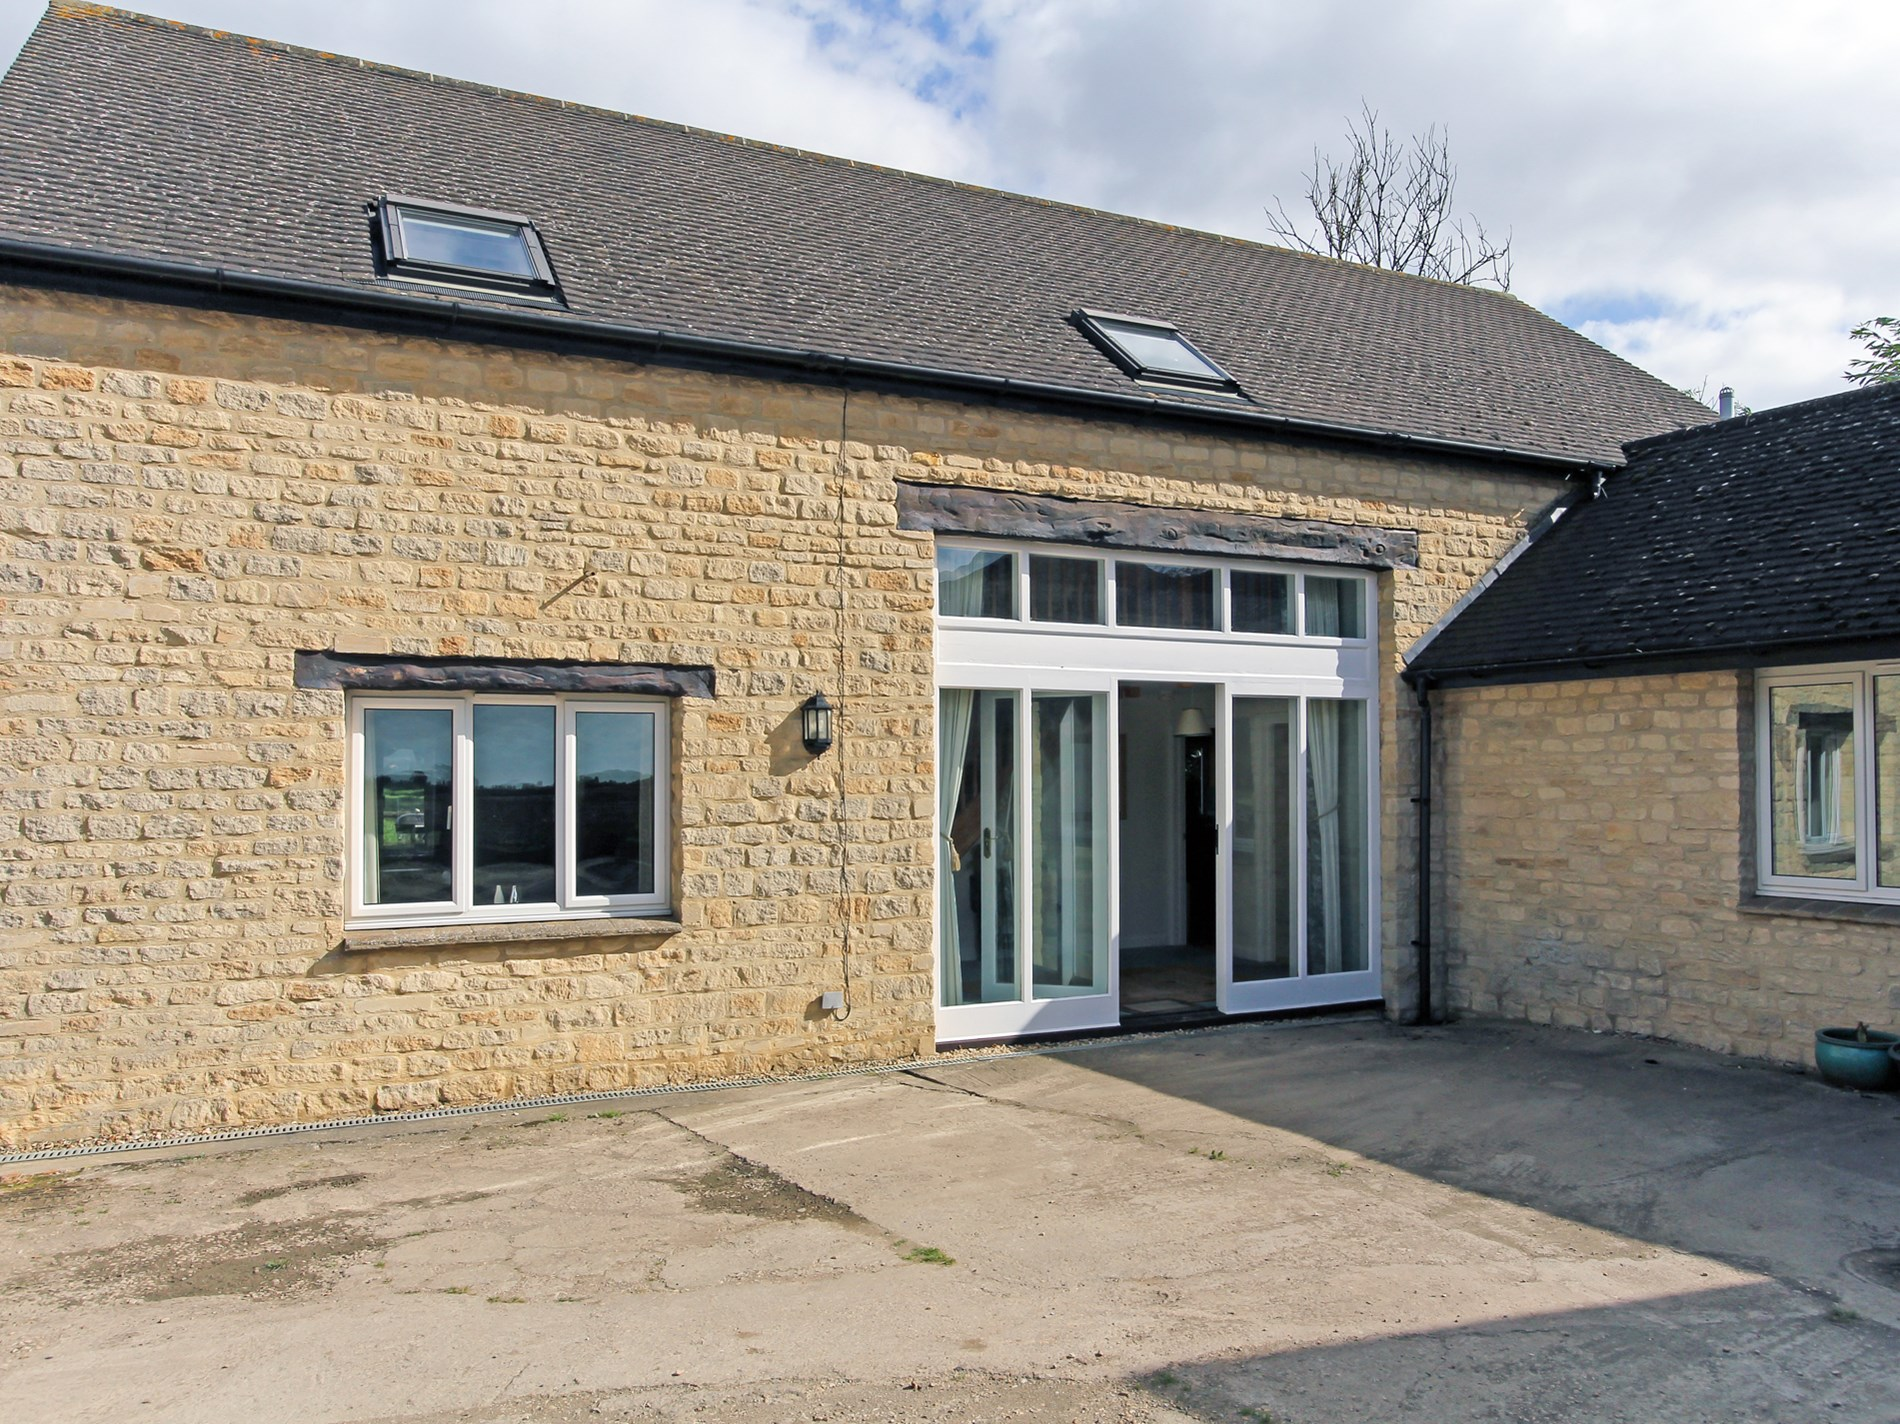 Ferienhaus in Witney